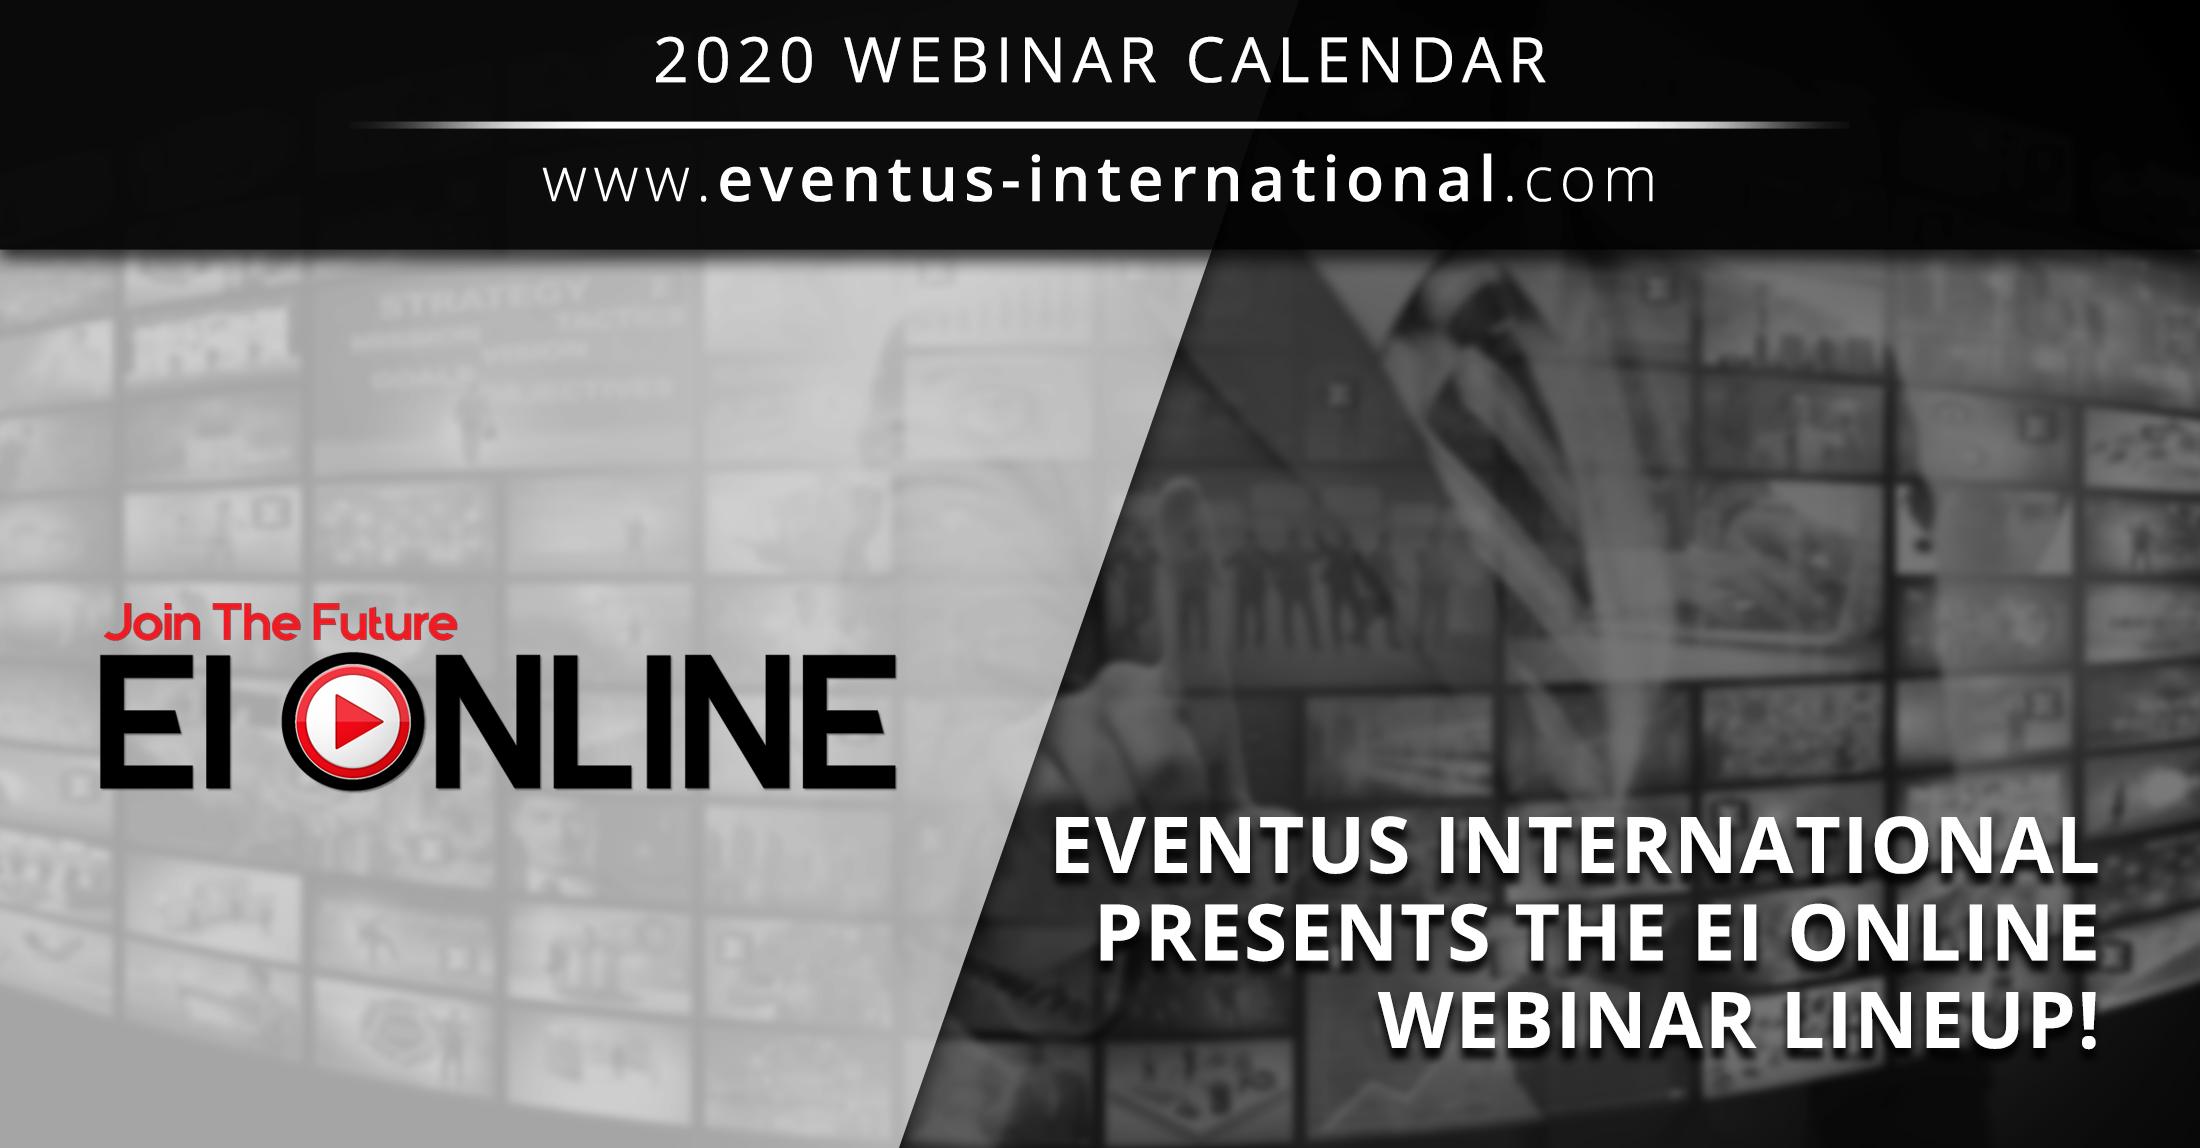 Webinar Offering: Eventus International Presents EI ONLINE World-Class Gaming Content